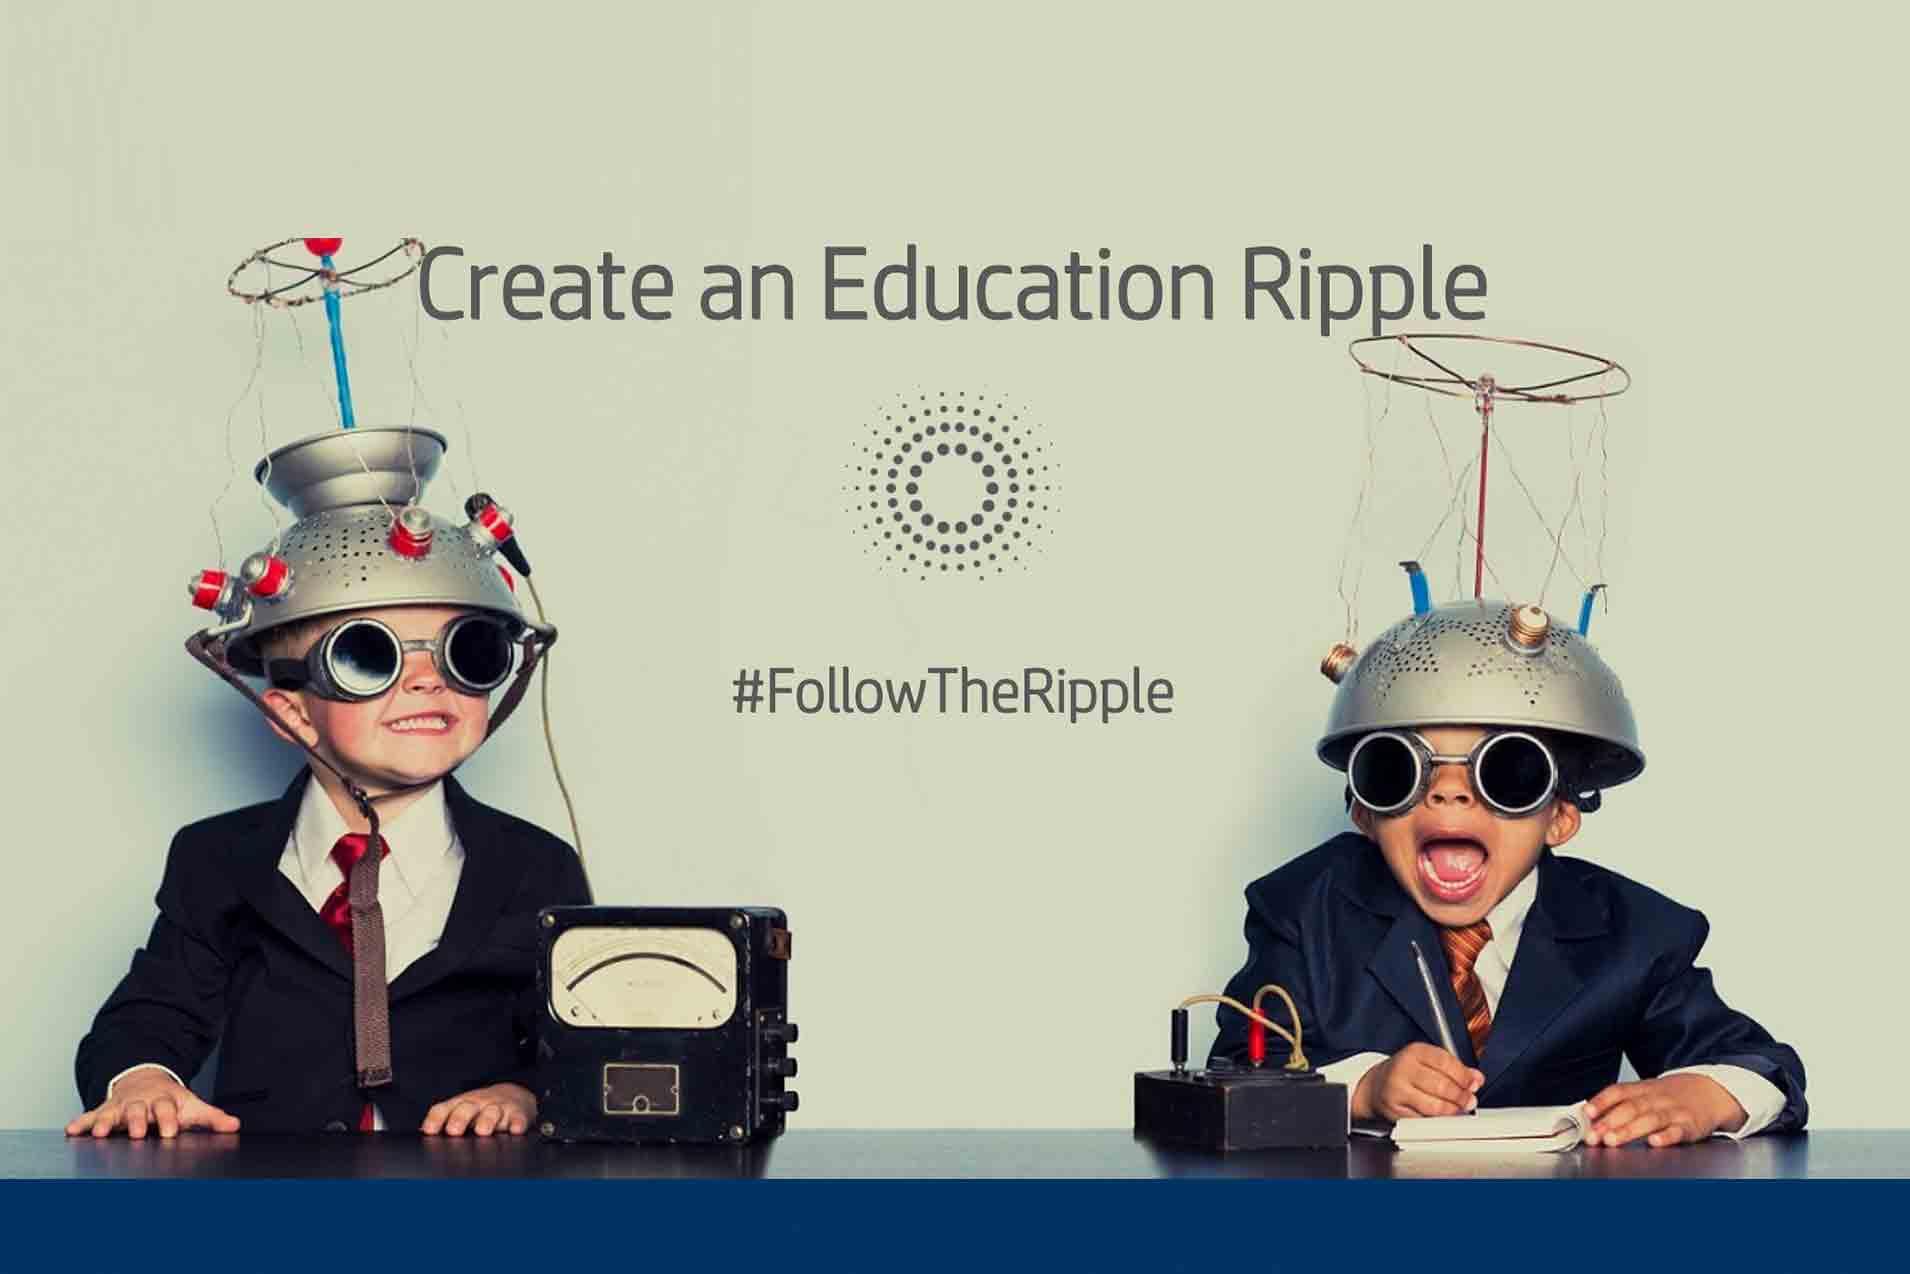 Follow the Ripple